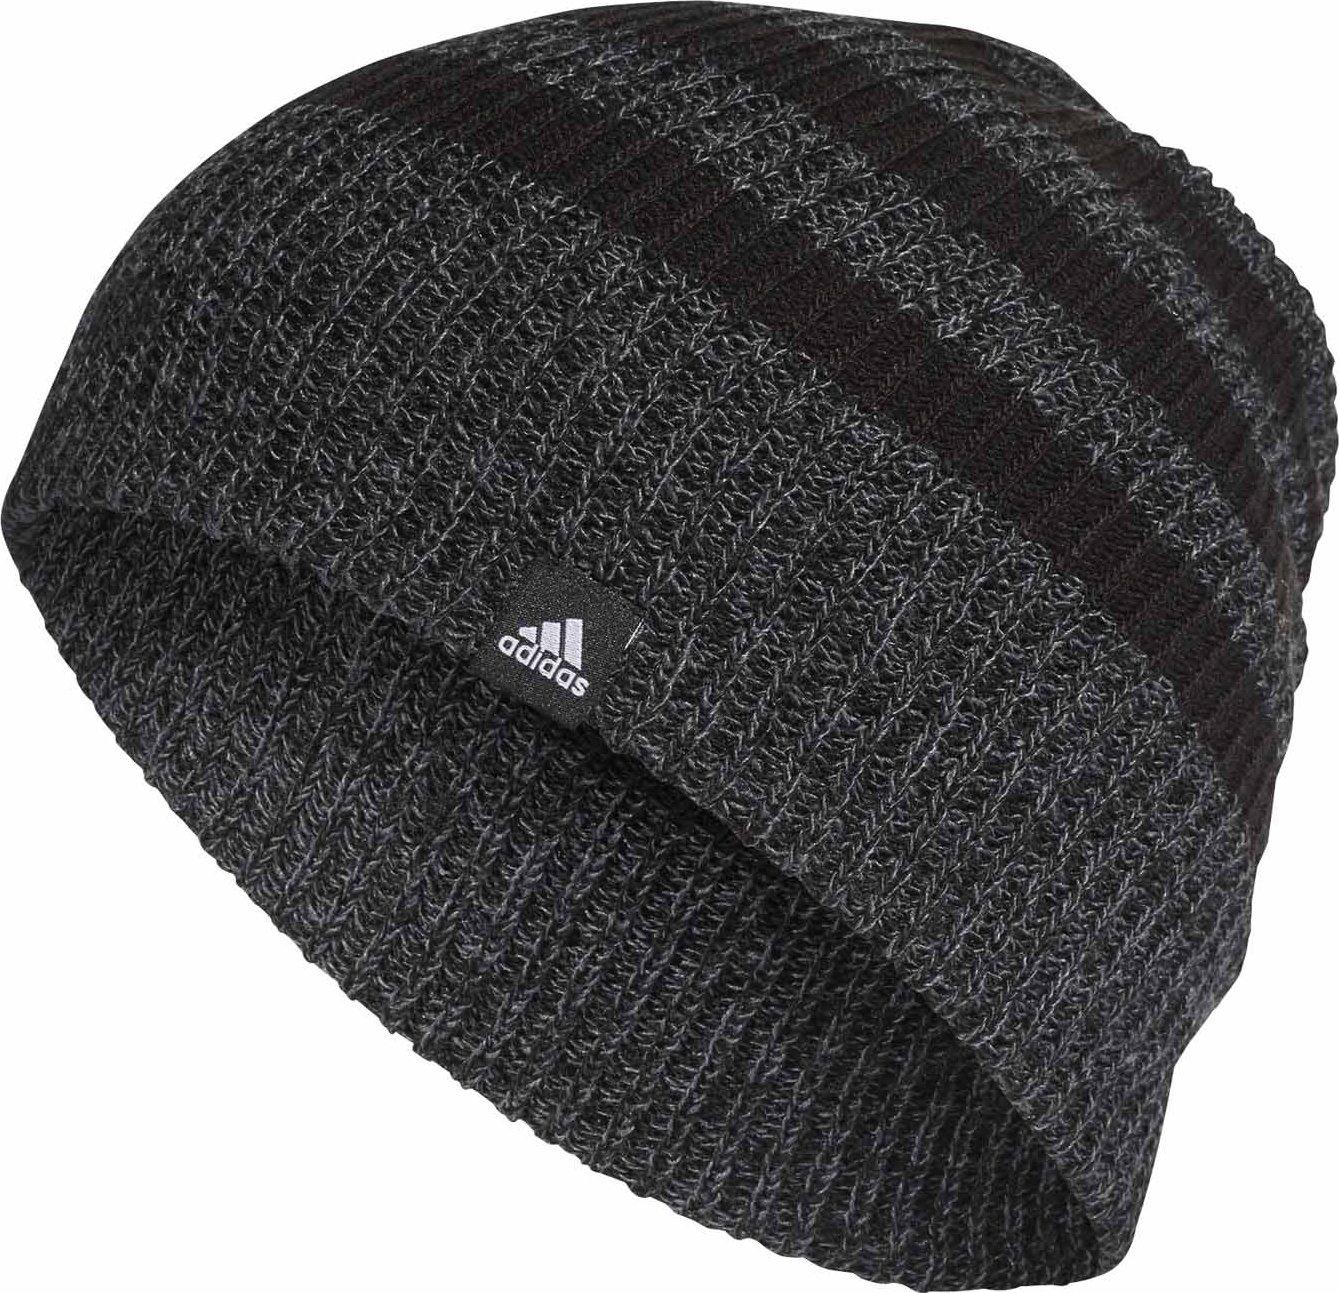 Adidas 3s Beanie BR9927 tmavě šedá Uni od 222 Kč • Zboží.cz 4efb18ece2